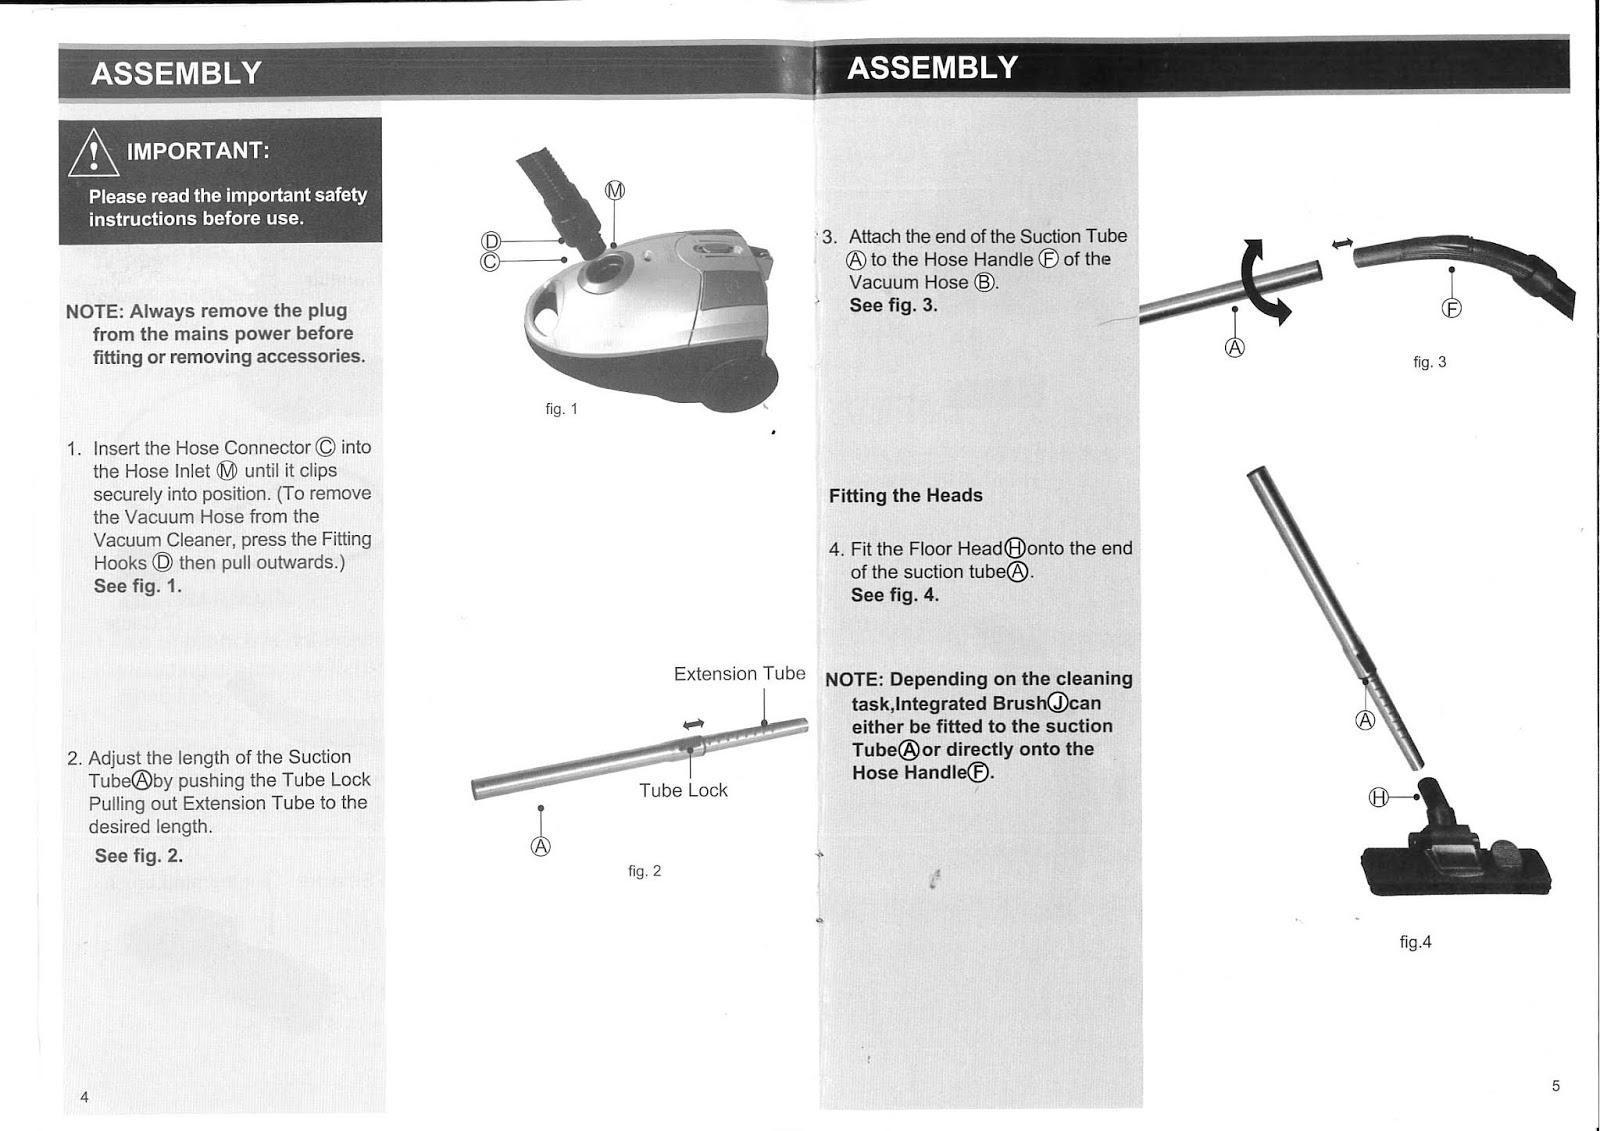 ProAction (Argos) CS869J Vacuum Cleaner Instruction Manual